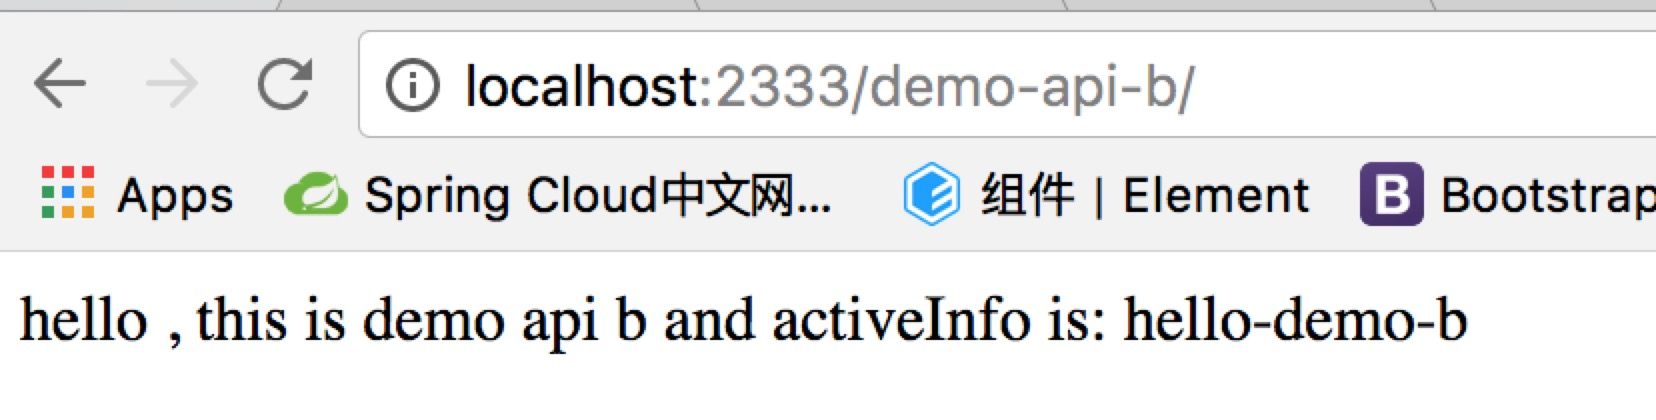 demo-api-b.jpg